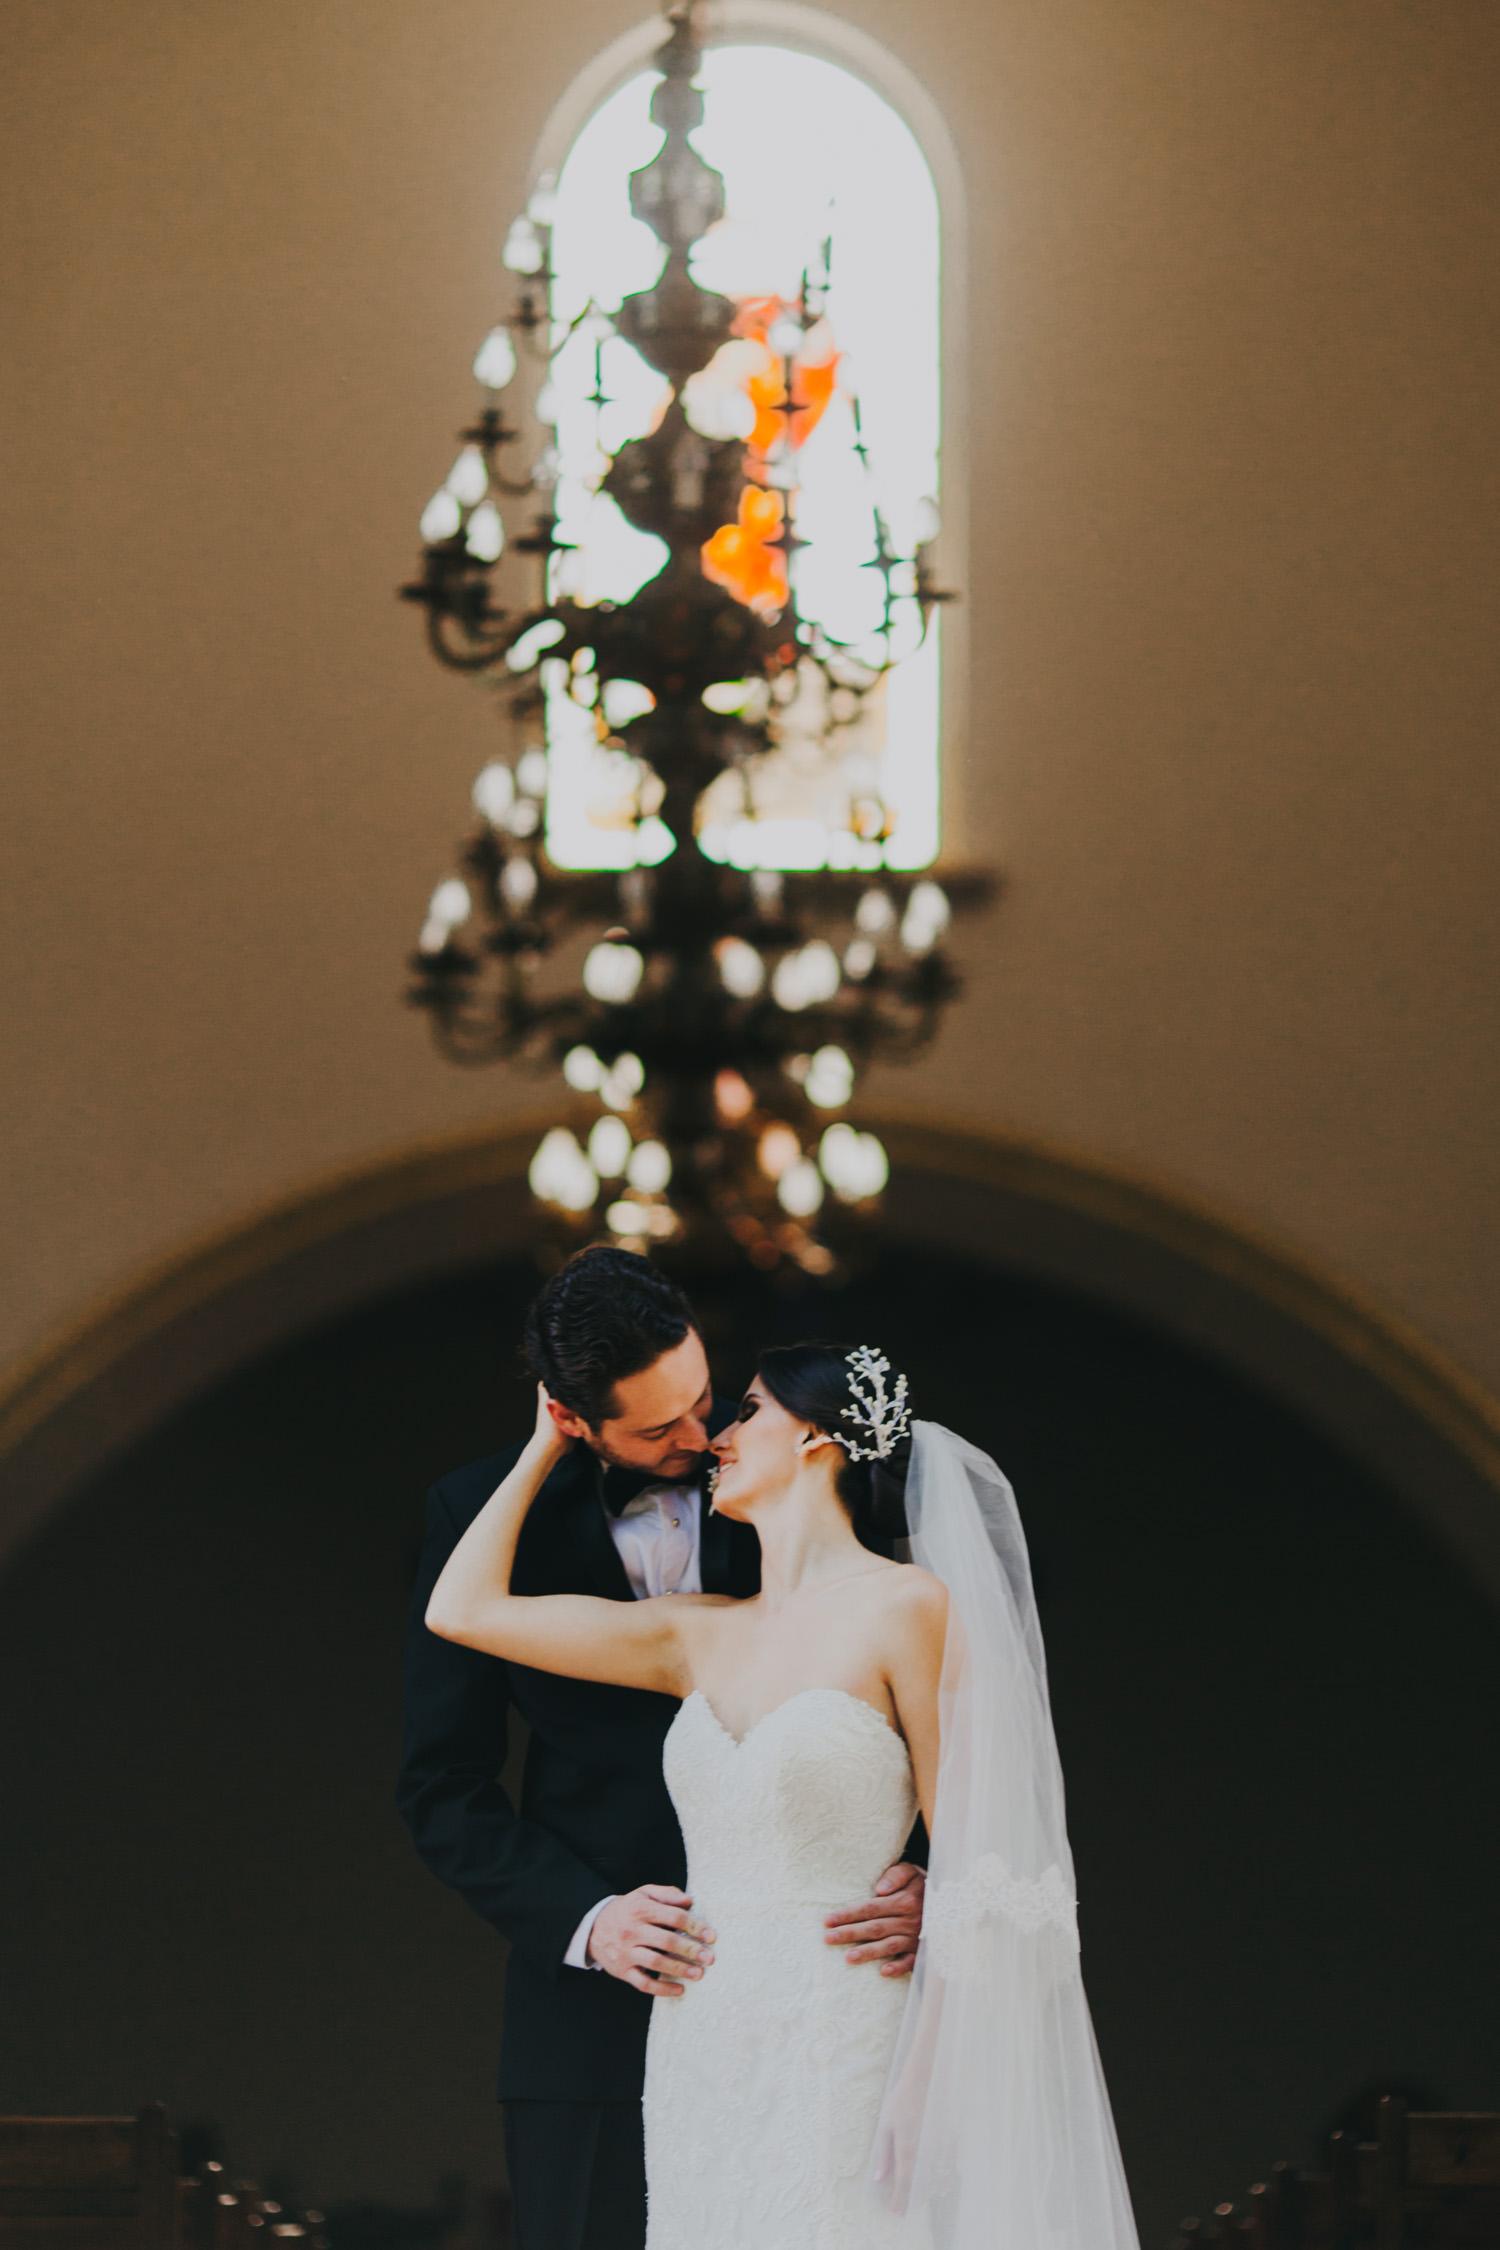 irapuato-boda-fotografia-jardines-alcalde-guanajuato-paulina-juan-pedro--19.jpg